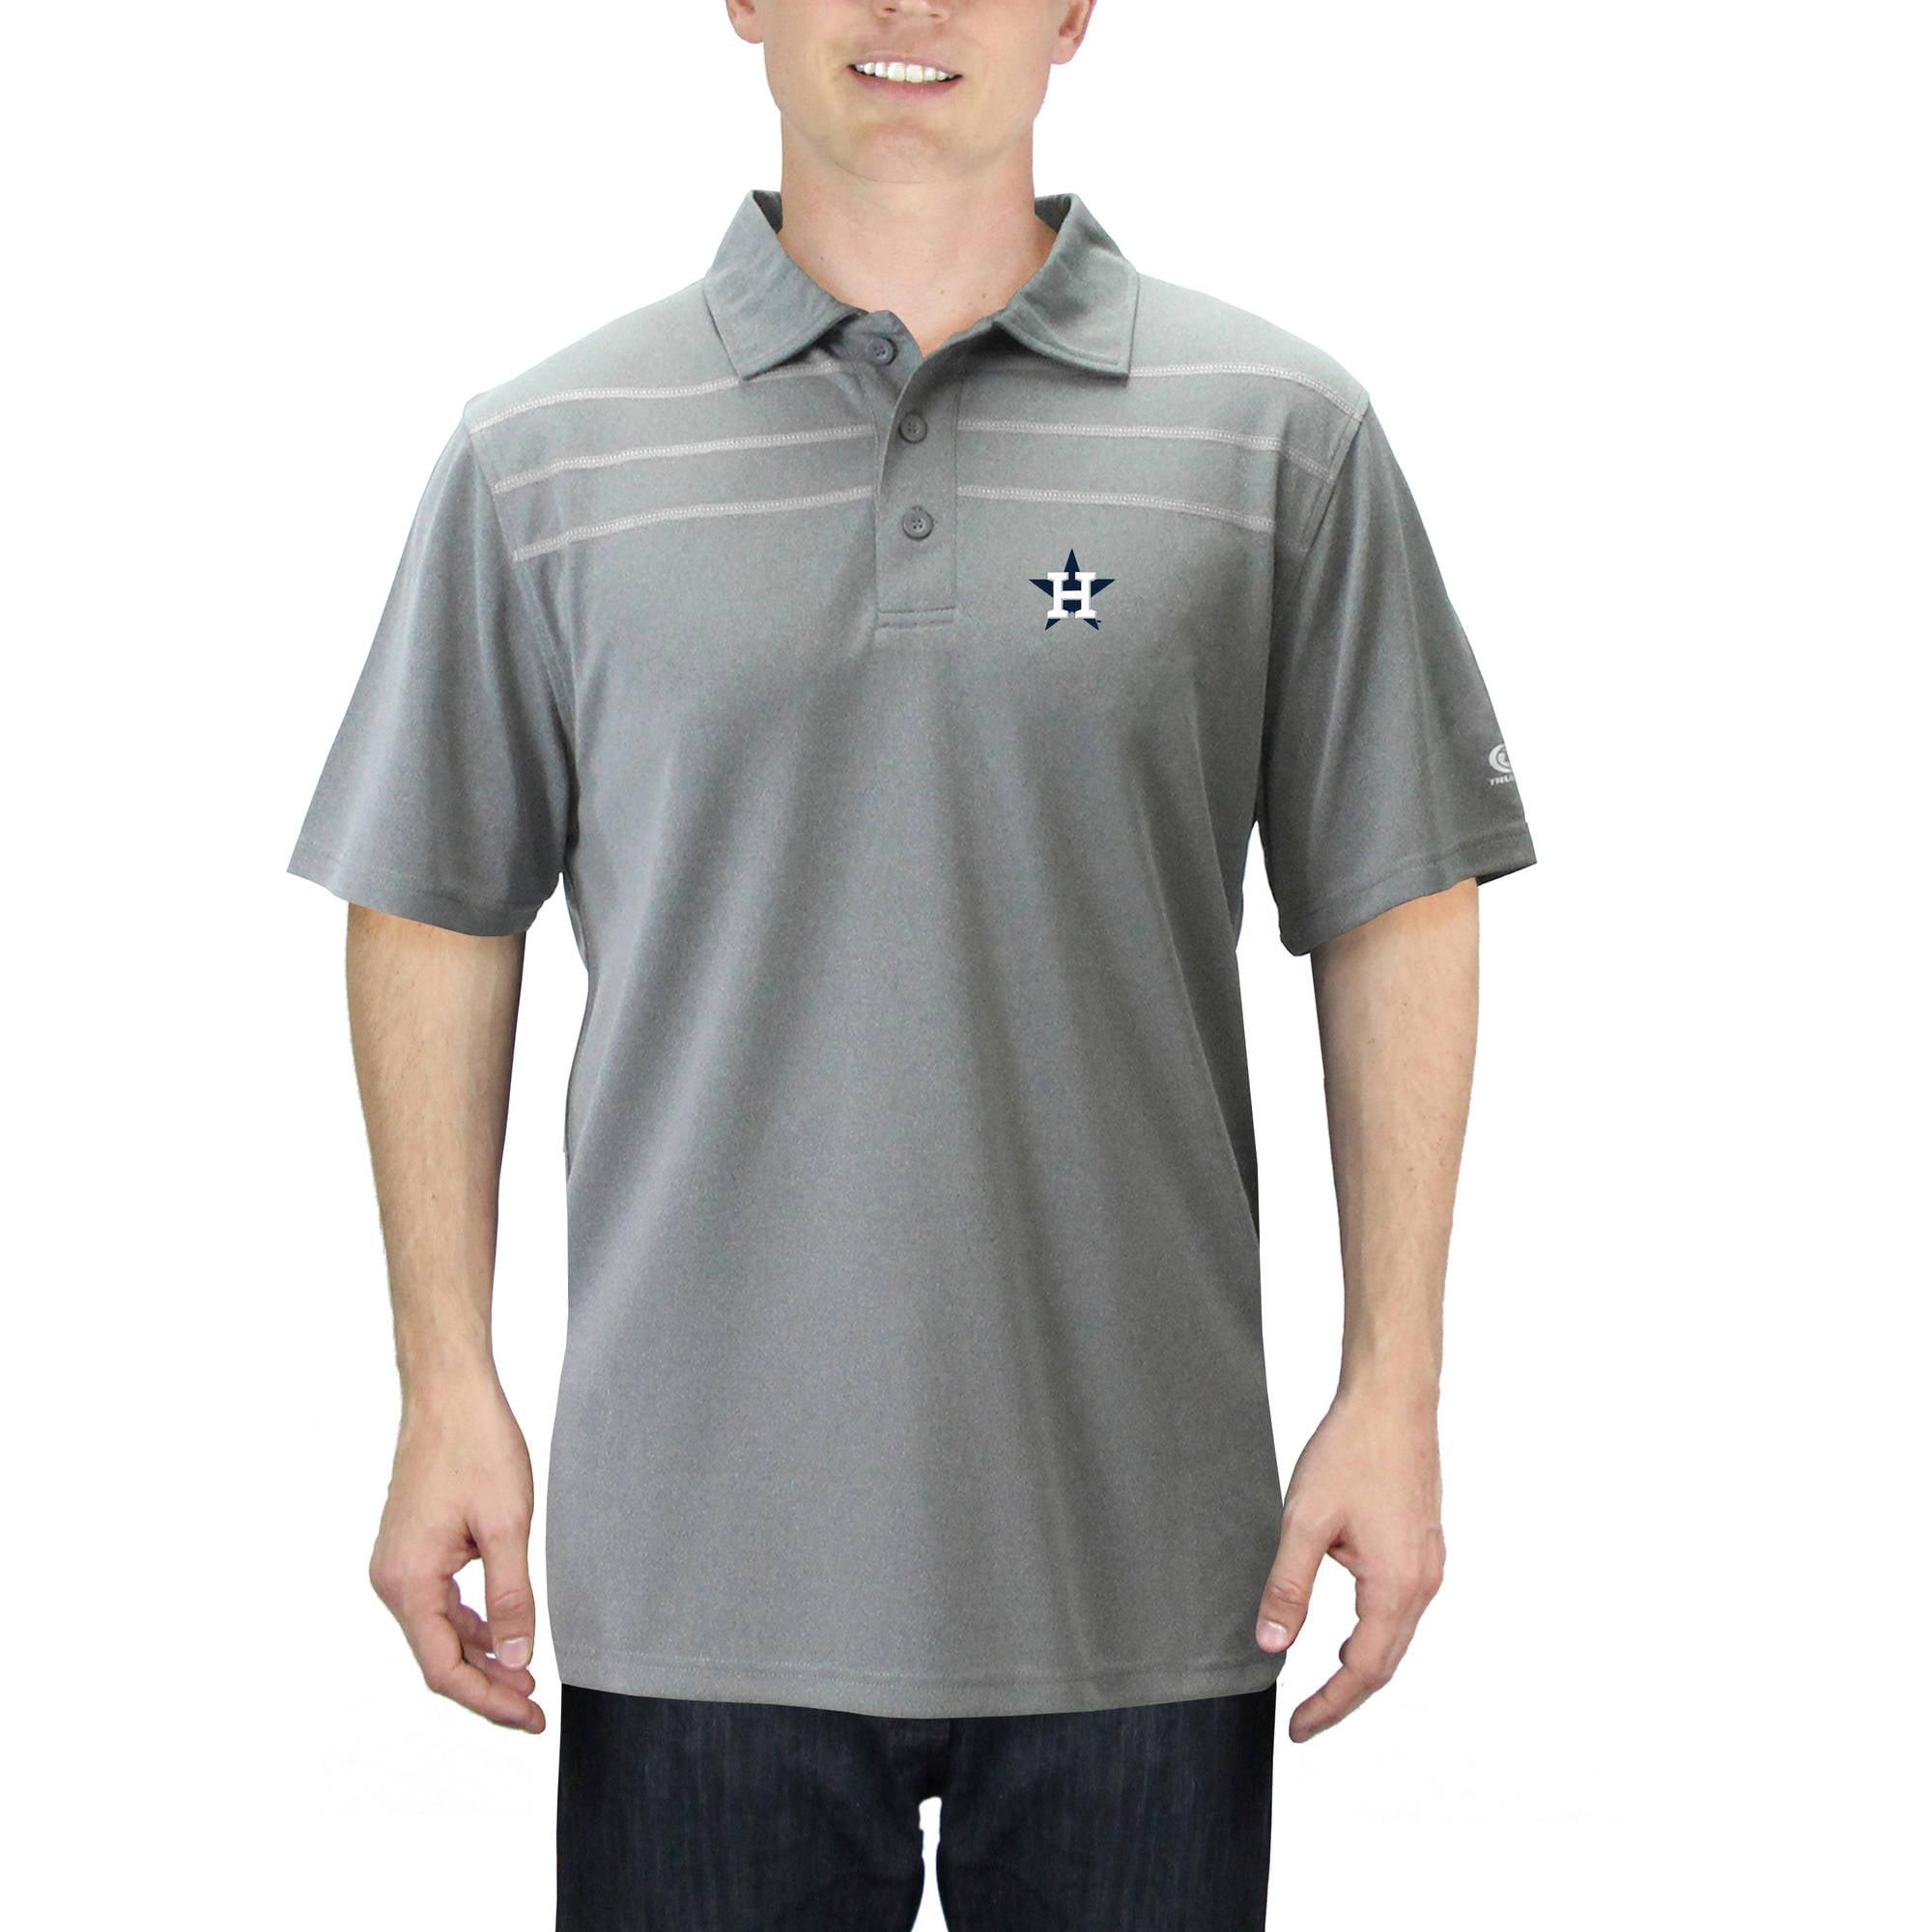 MLB Houston Astros Big Men's Mini Pique Short Sleeve Polo, 2XL